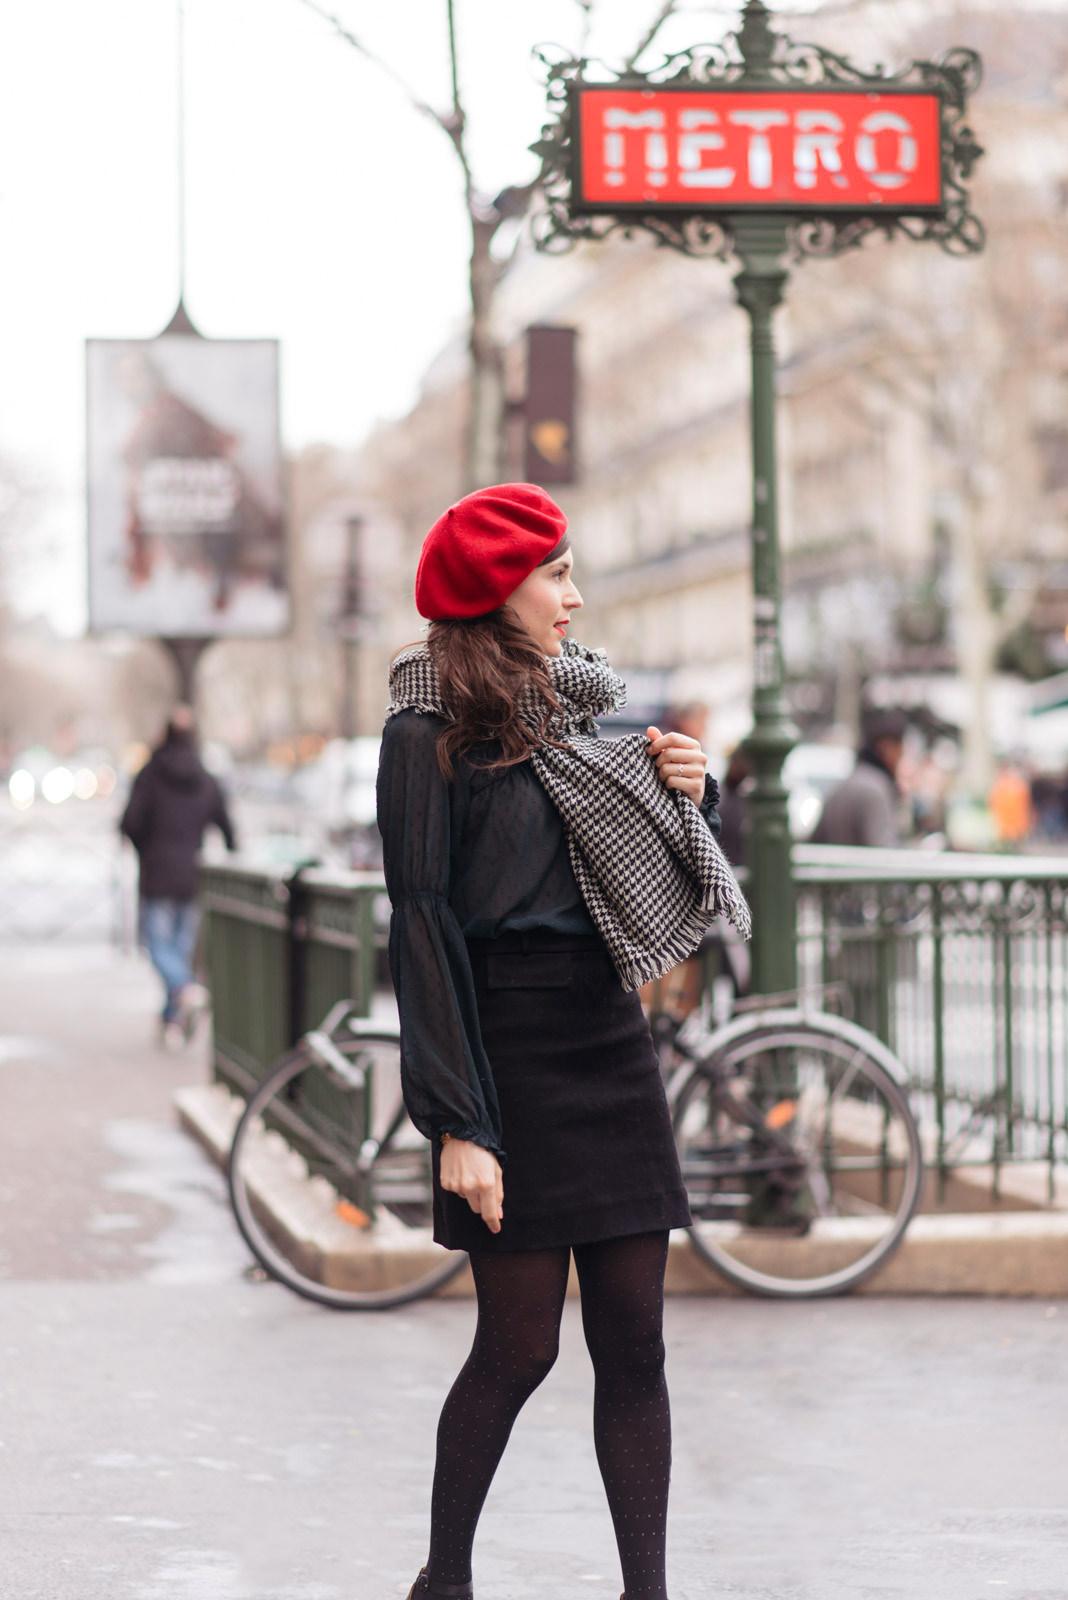 Blog-Mode-And-The-City-Lifestyle-Wishlist-soldes-monoprix-2018-2